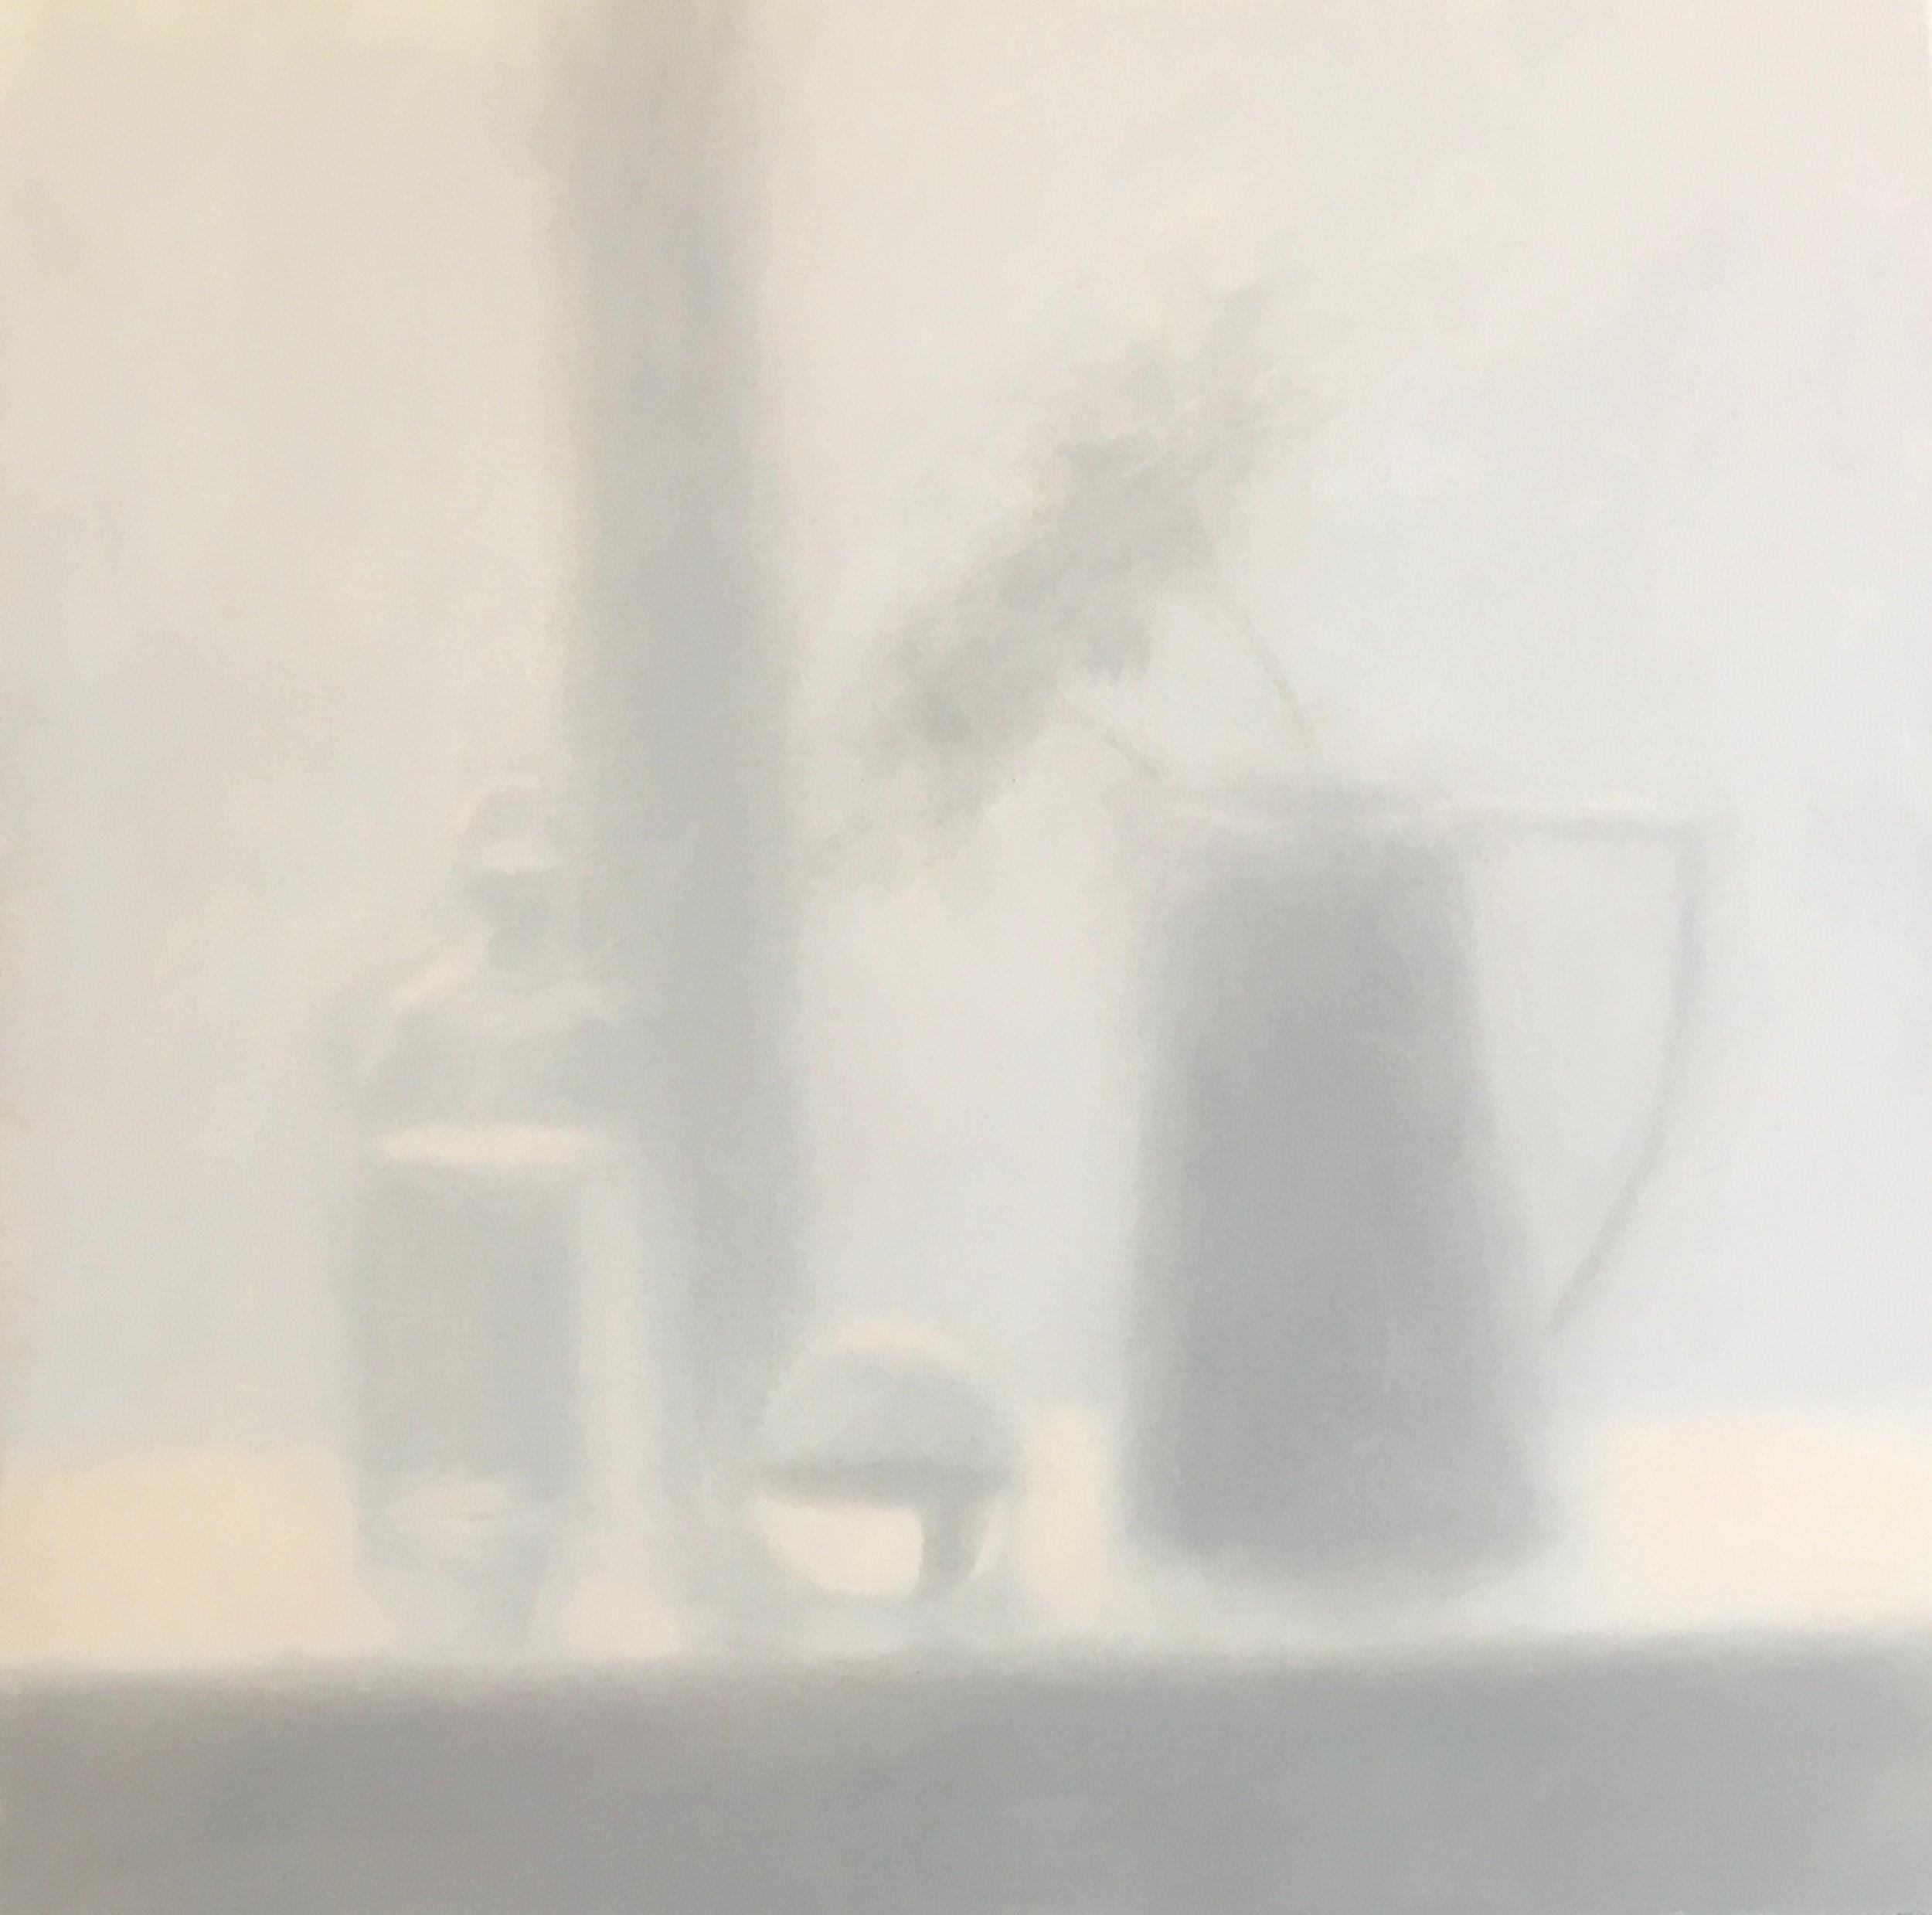 Artist: Harriet Porter  Title: Diffusion  Size: 63 x 63 cm  Medium: Oil on canvas  Price: £1700